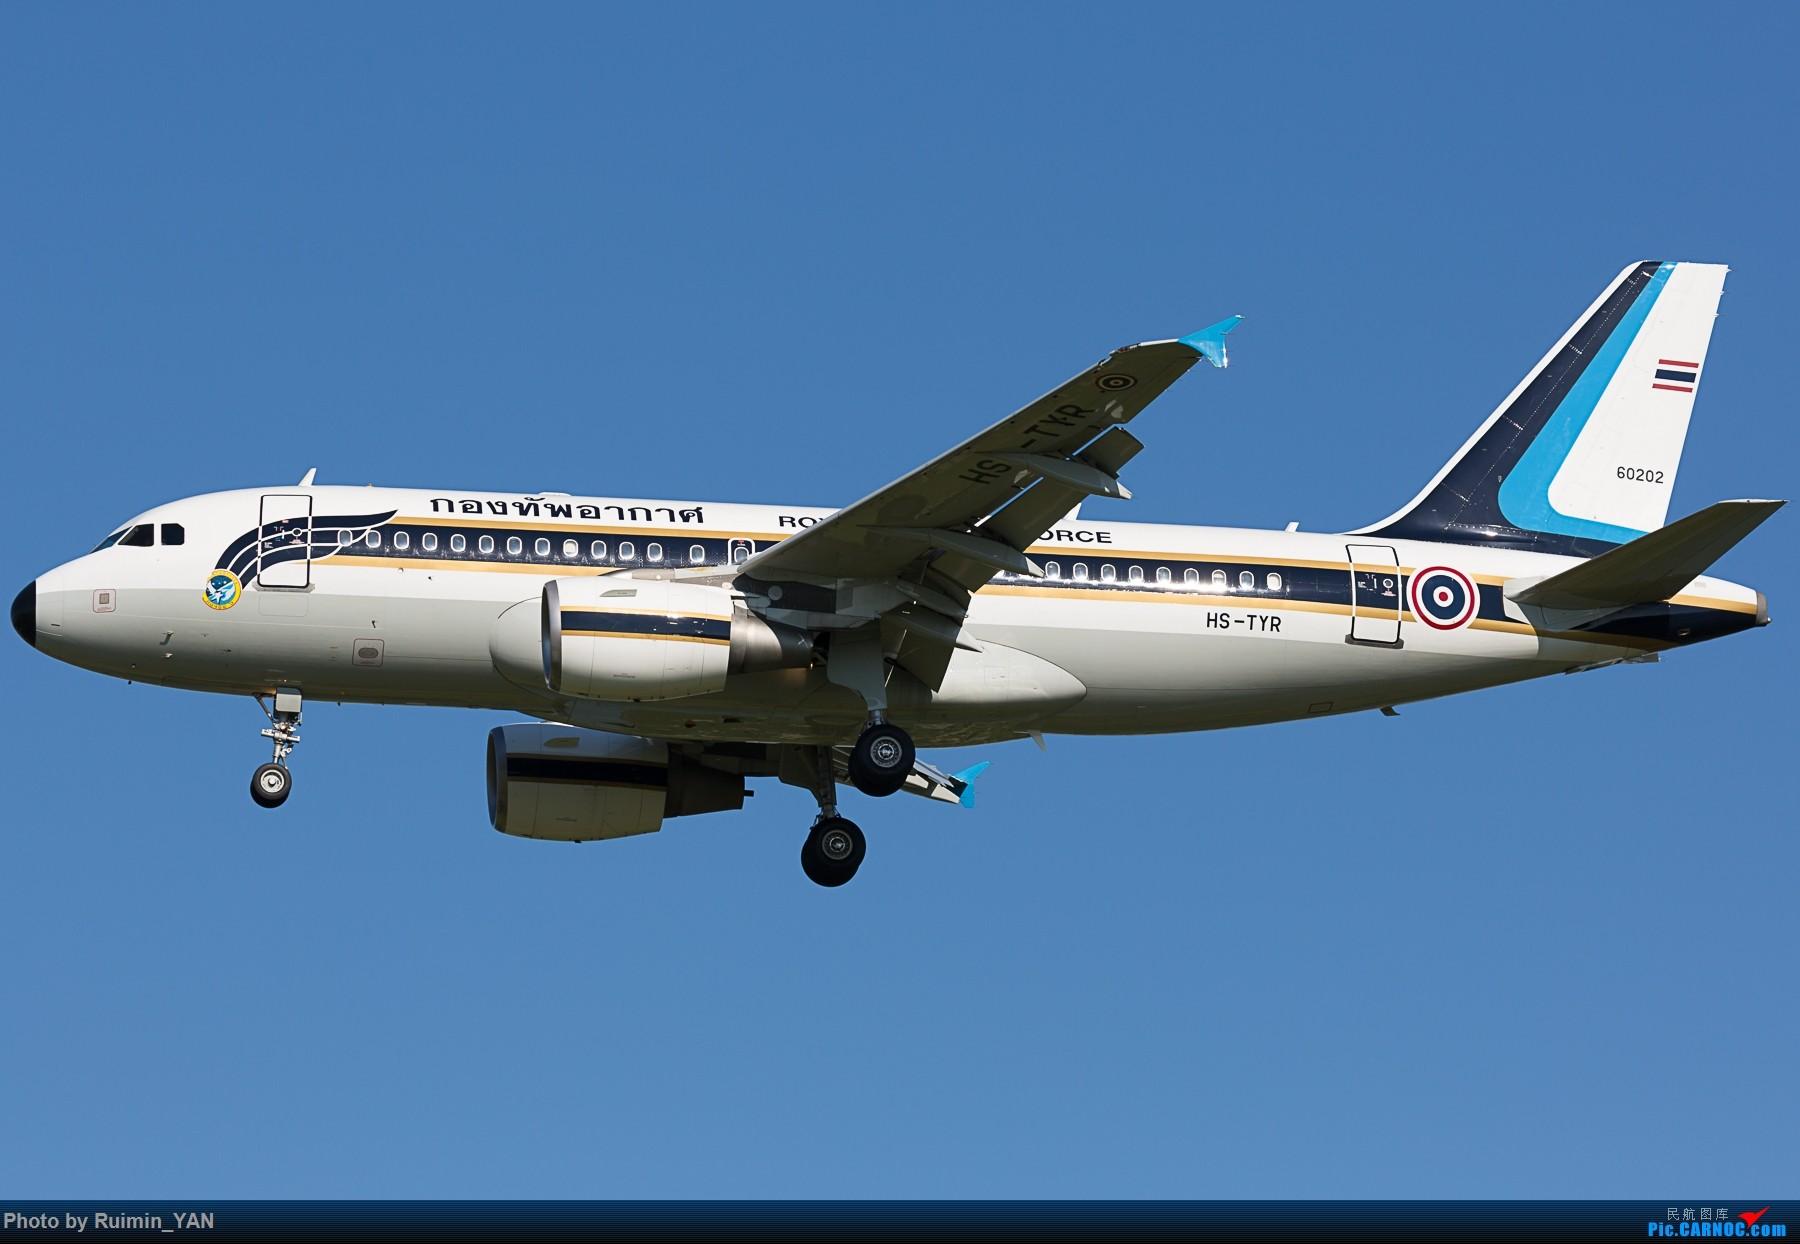 Re:[原创]【PEK】【砖机】泰国副总理兼国防部长巴维访华 泰国皇家空军(RTAF, Royal Thai Air Force) HS-TYR A319CJ AIRBUS A319-115CJ HS-TYR 中国北京首都国际机场